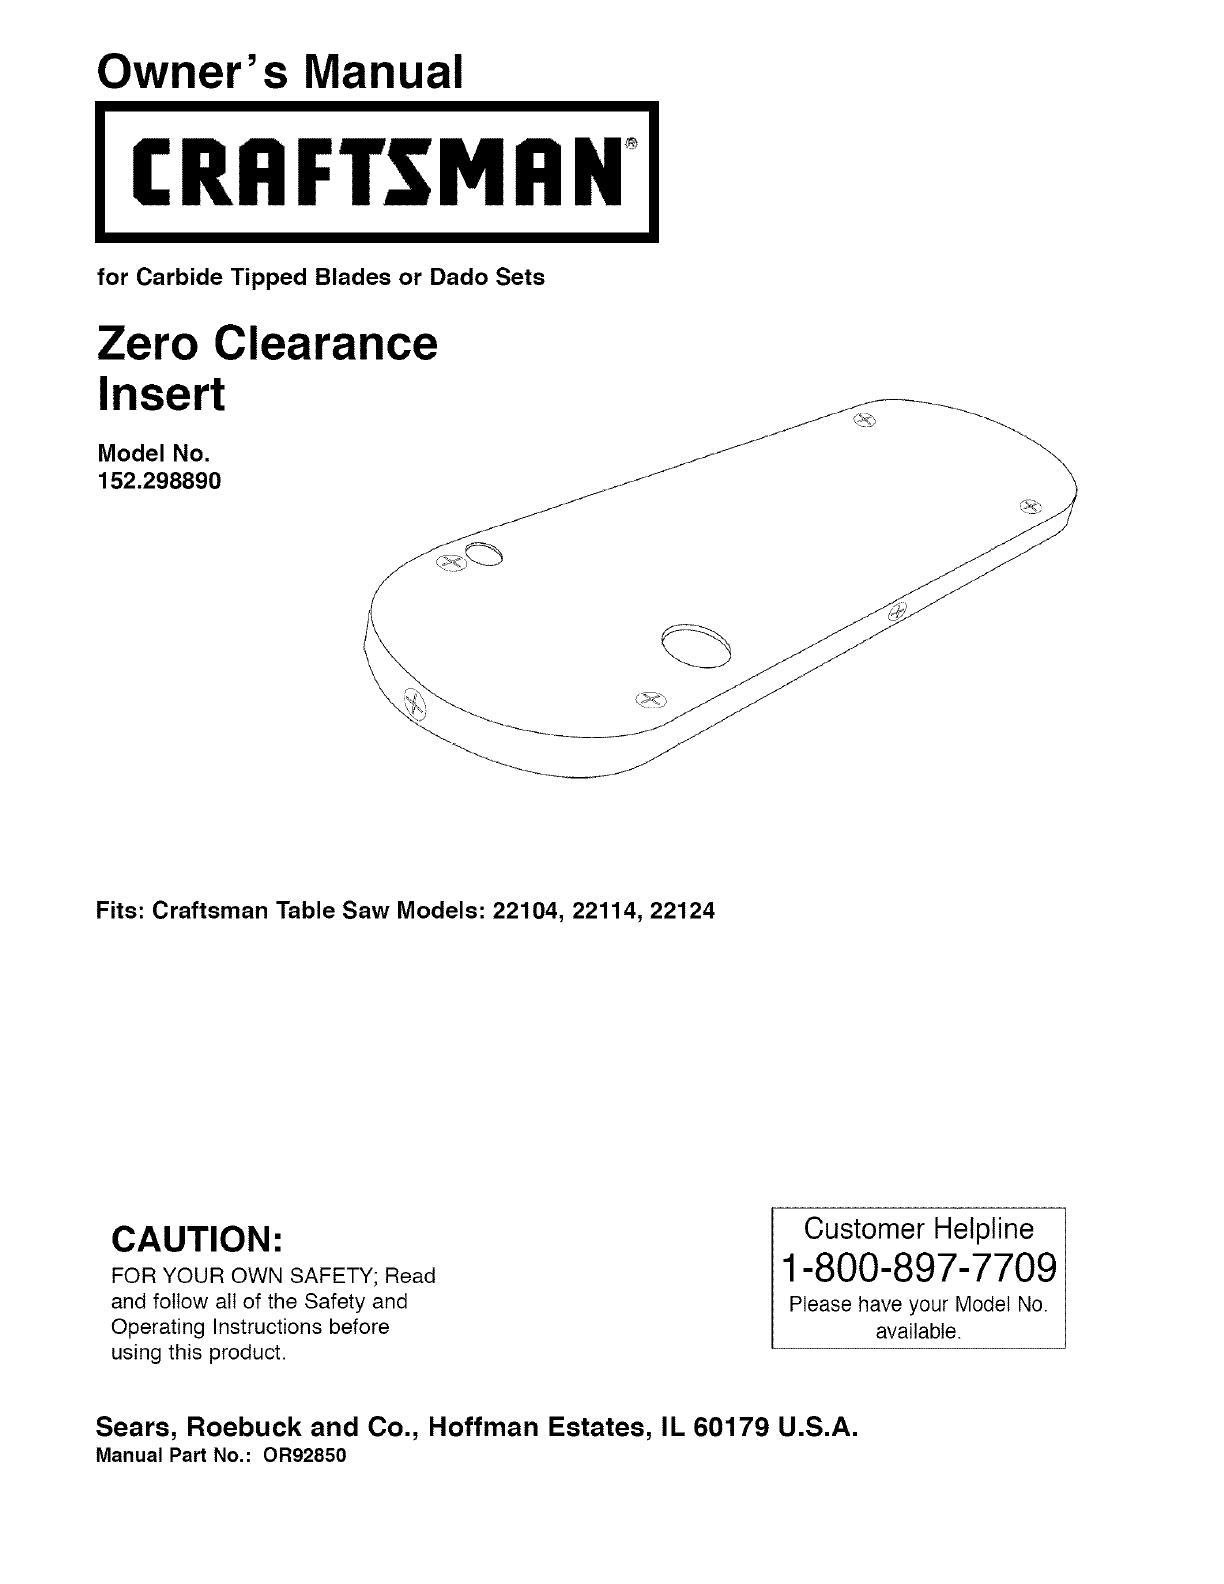 Craftsman 22124 Manual